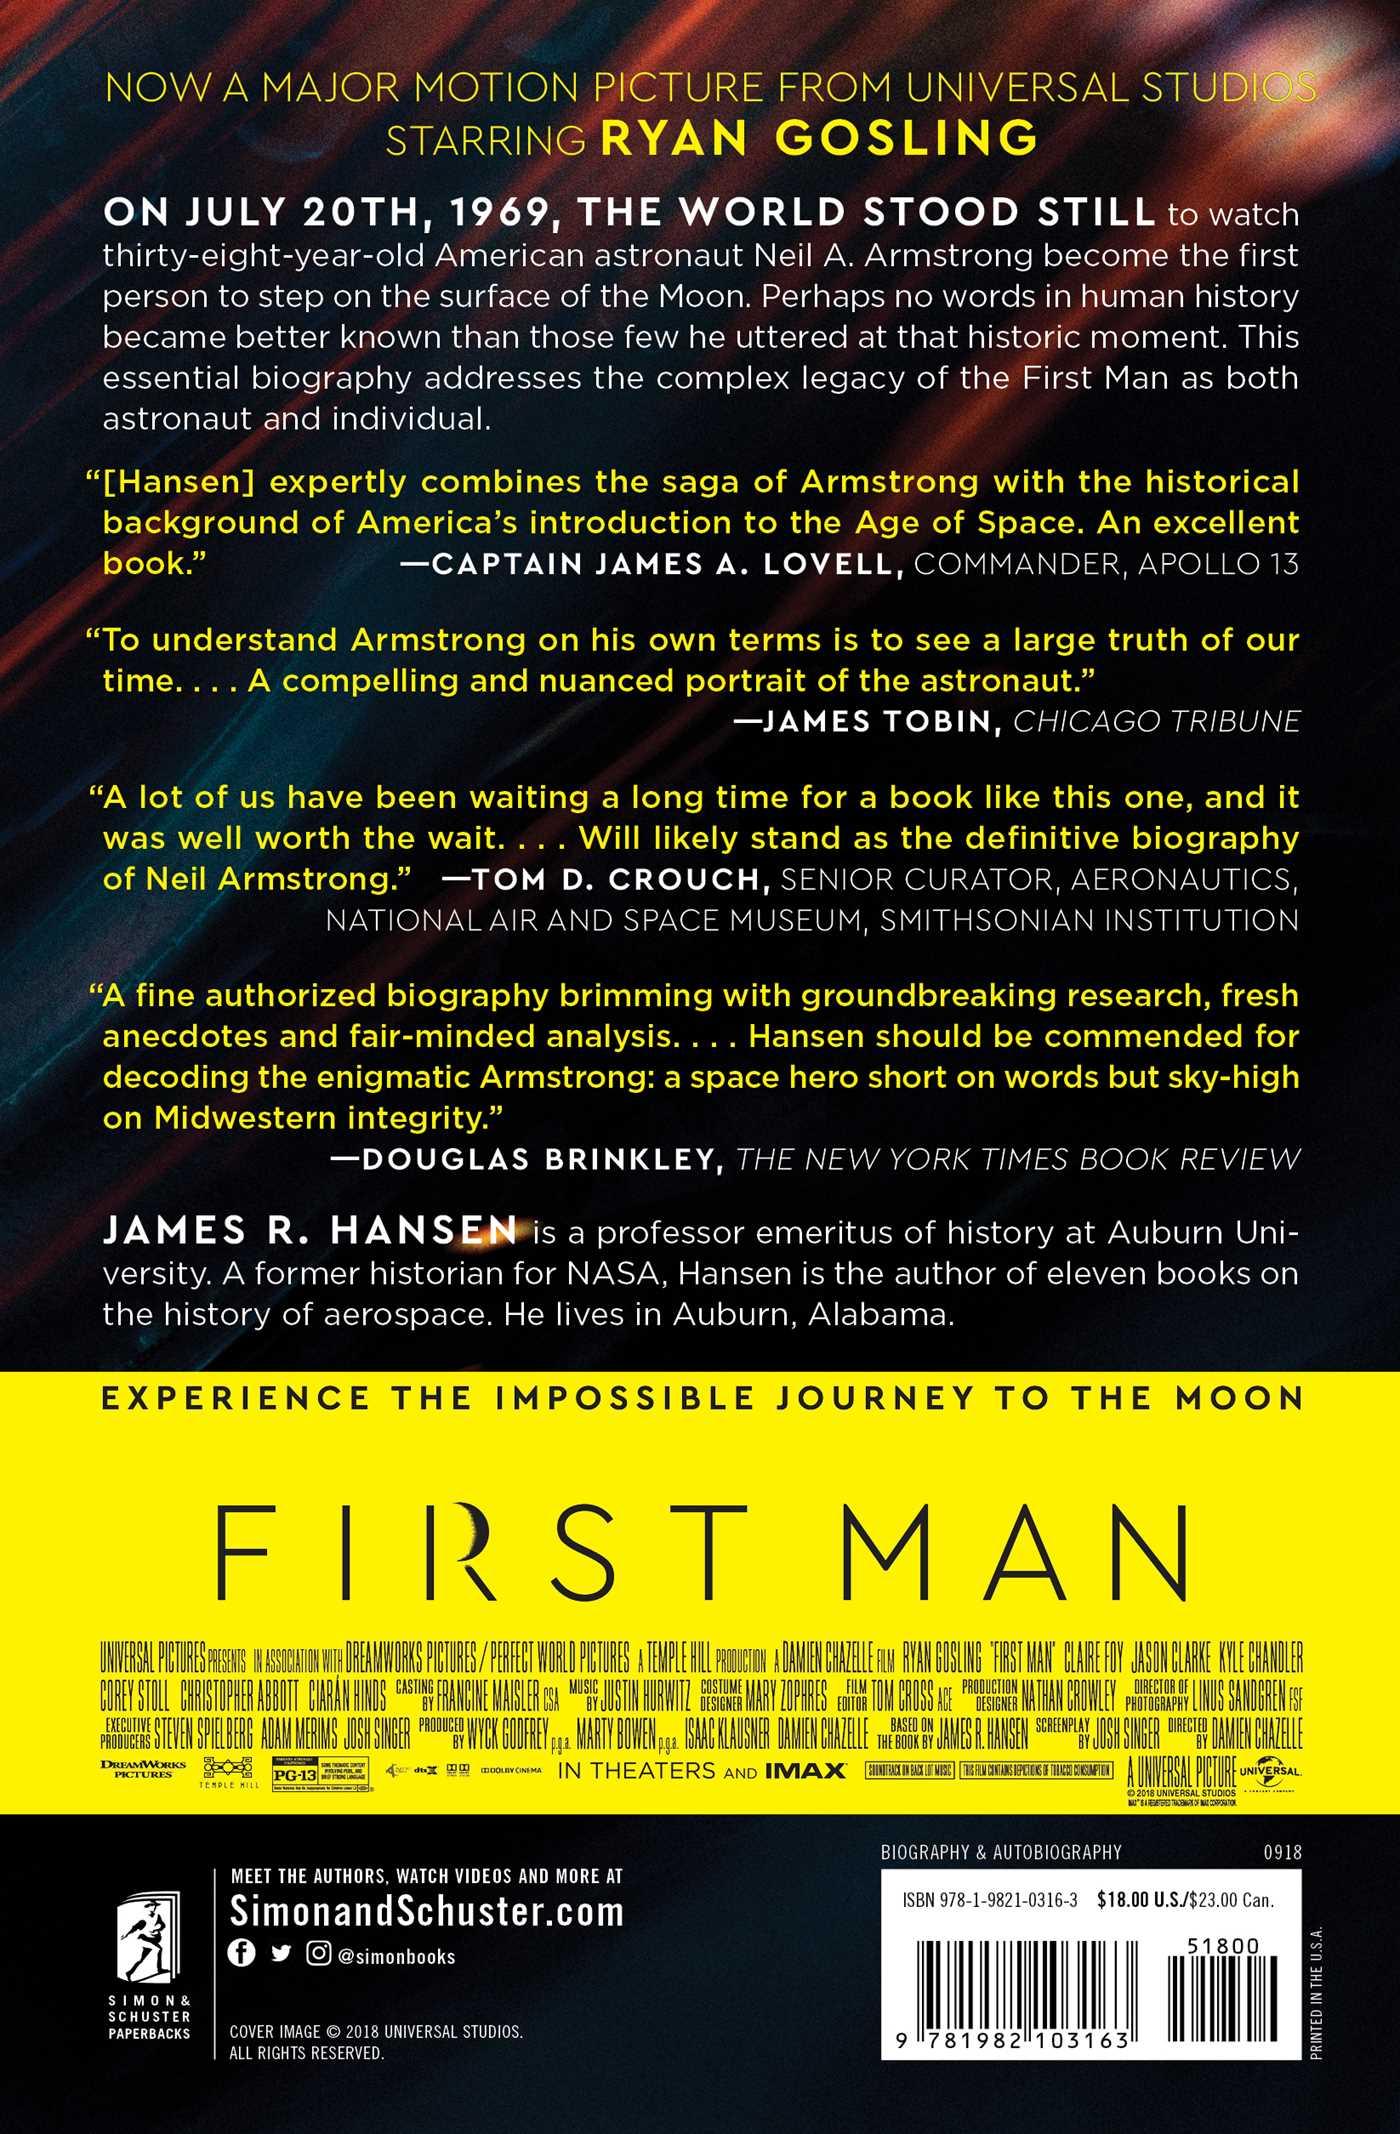 First man 9781982103163 hr back